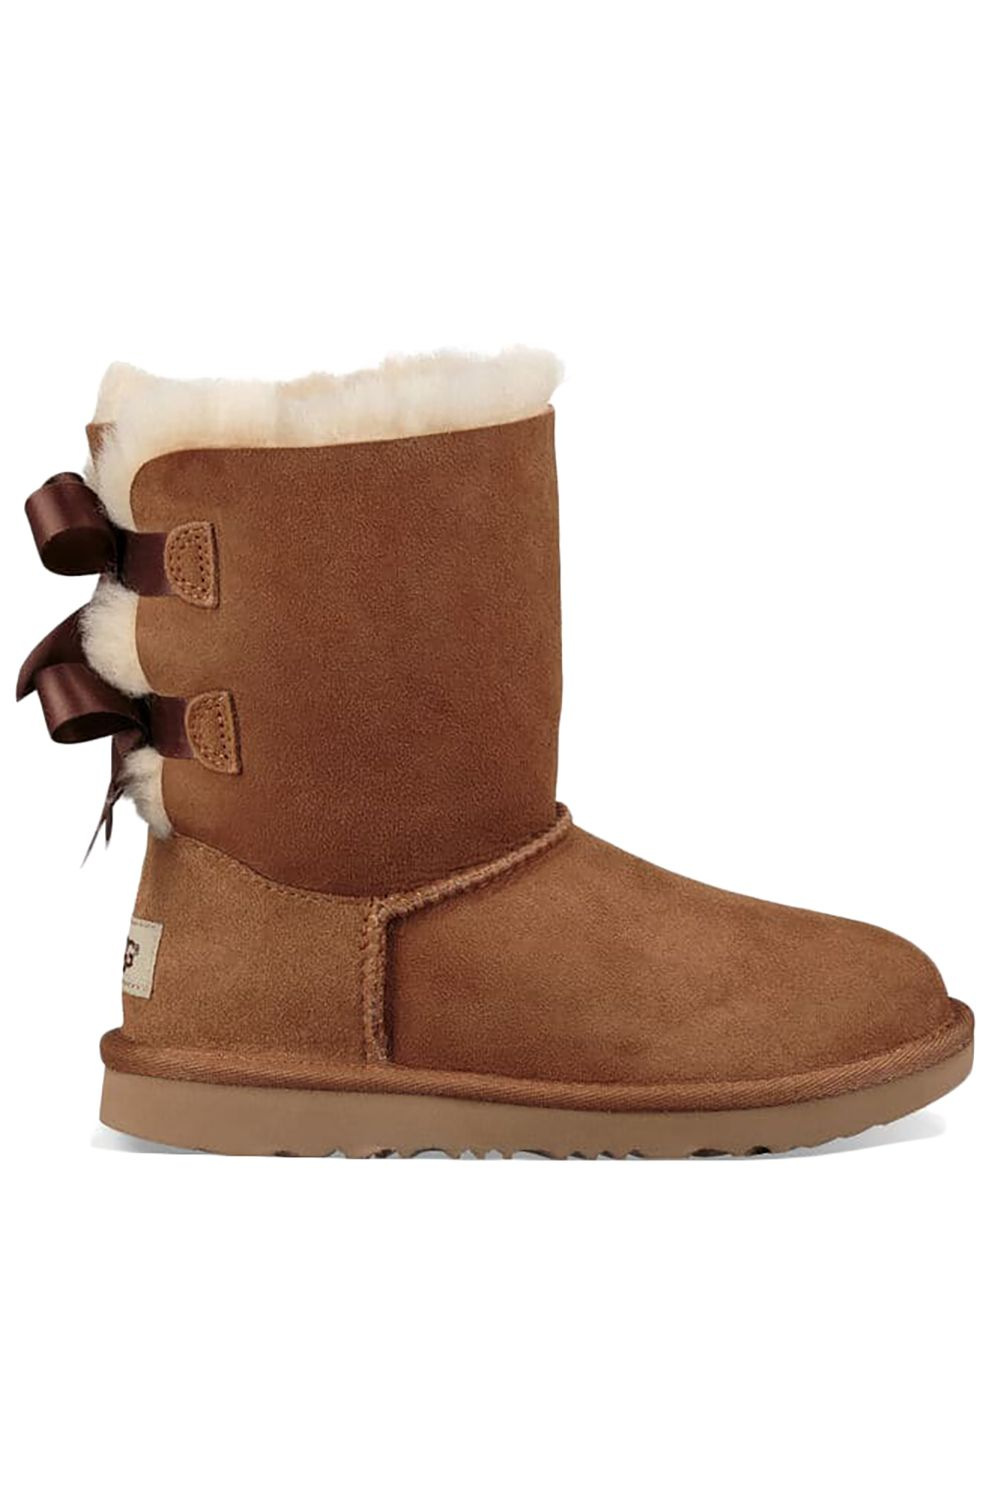 Ugg Boots BAILEY BOW II Chestnut